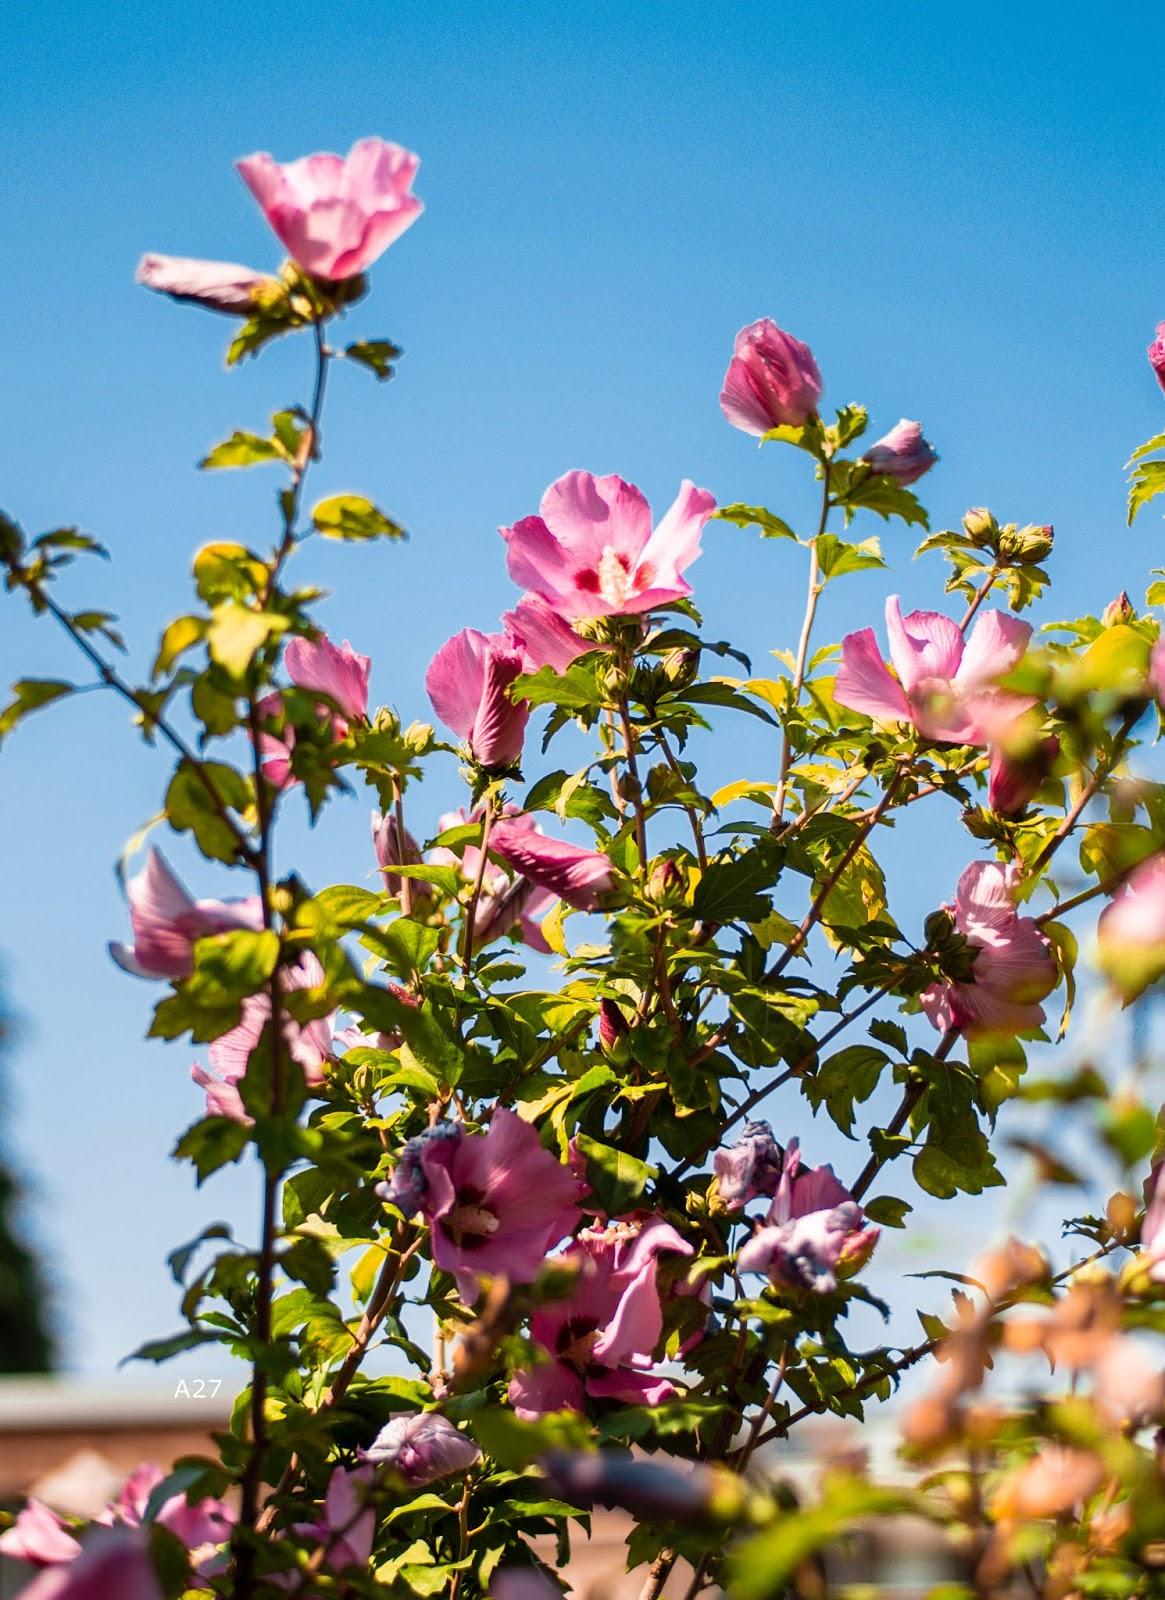 PINK SUMMER FLOWERS | ANNA TWENTY SEVEN 🌷